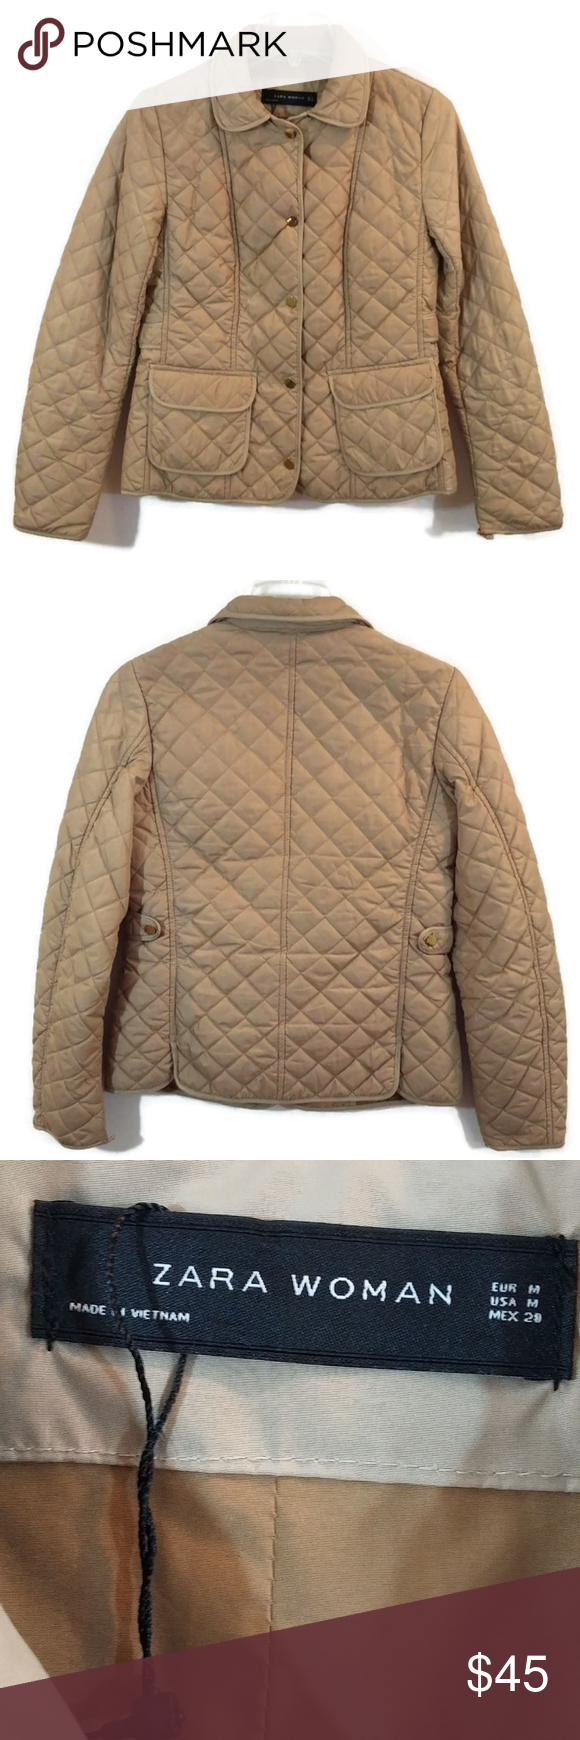 Zara Woman Tan Button Quilted Puffer Jacket Coat Quilted Puffer Jacket Zara Women Zara [ 1740 x 580 Pixel ]